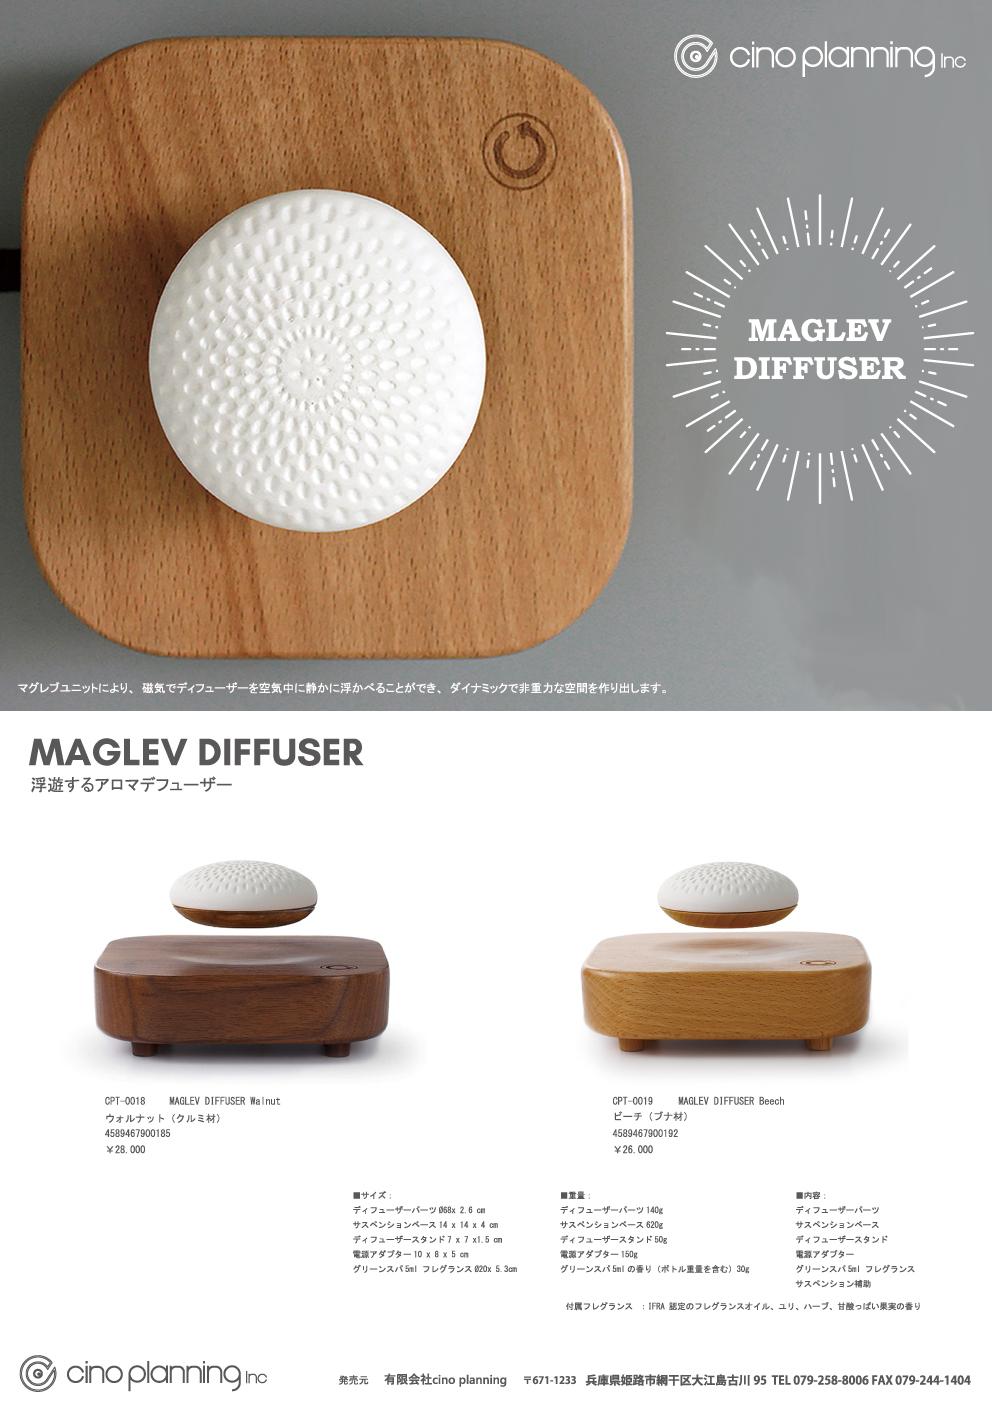 MAGLEV DIFFUSER